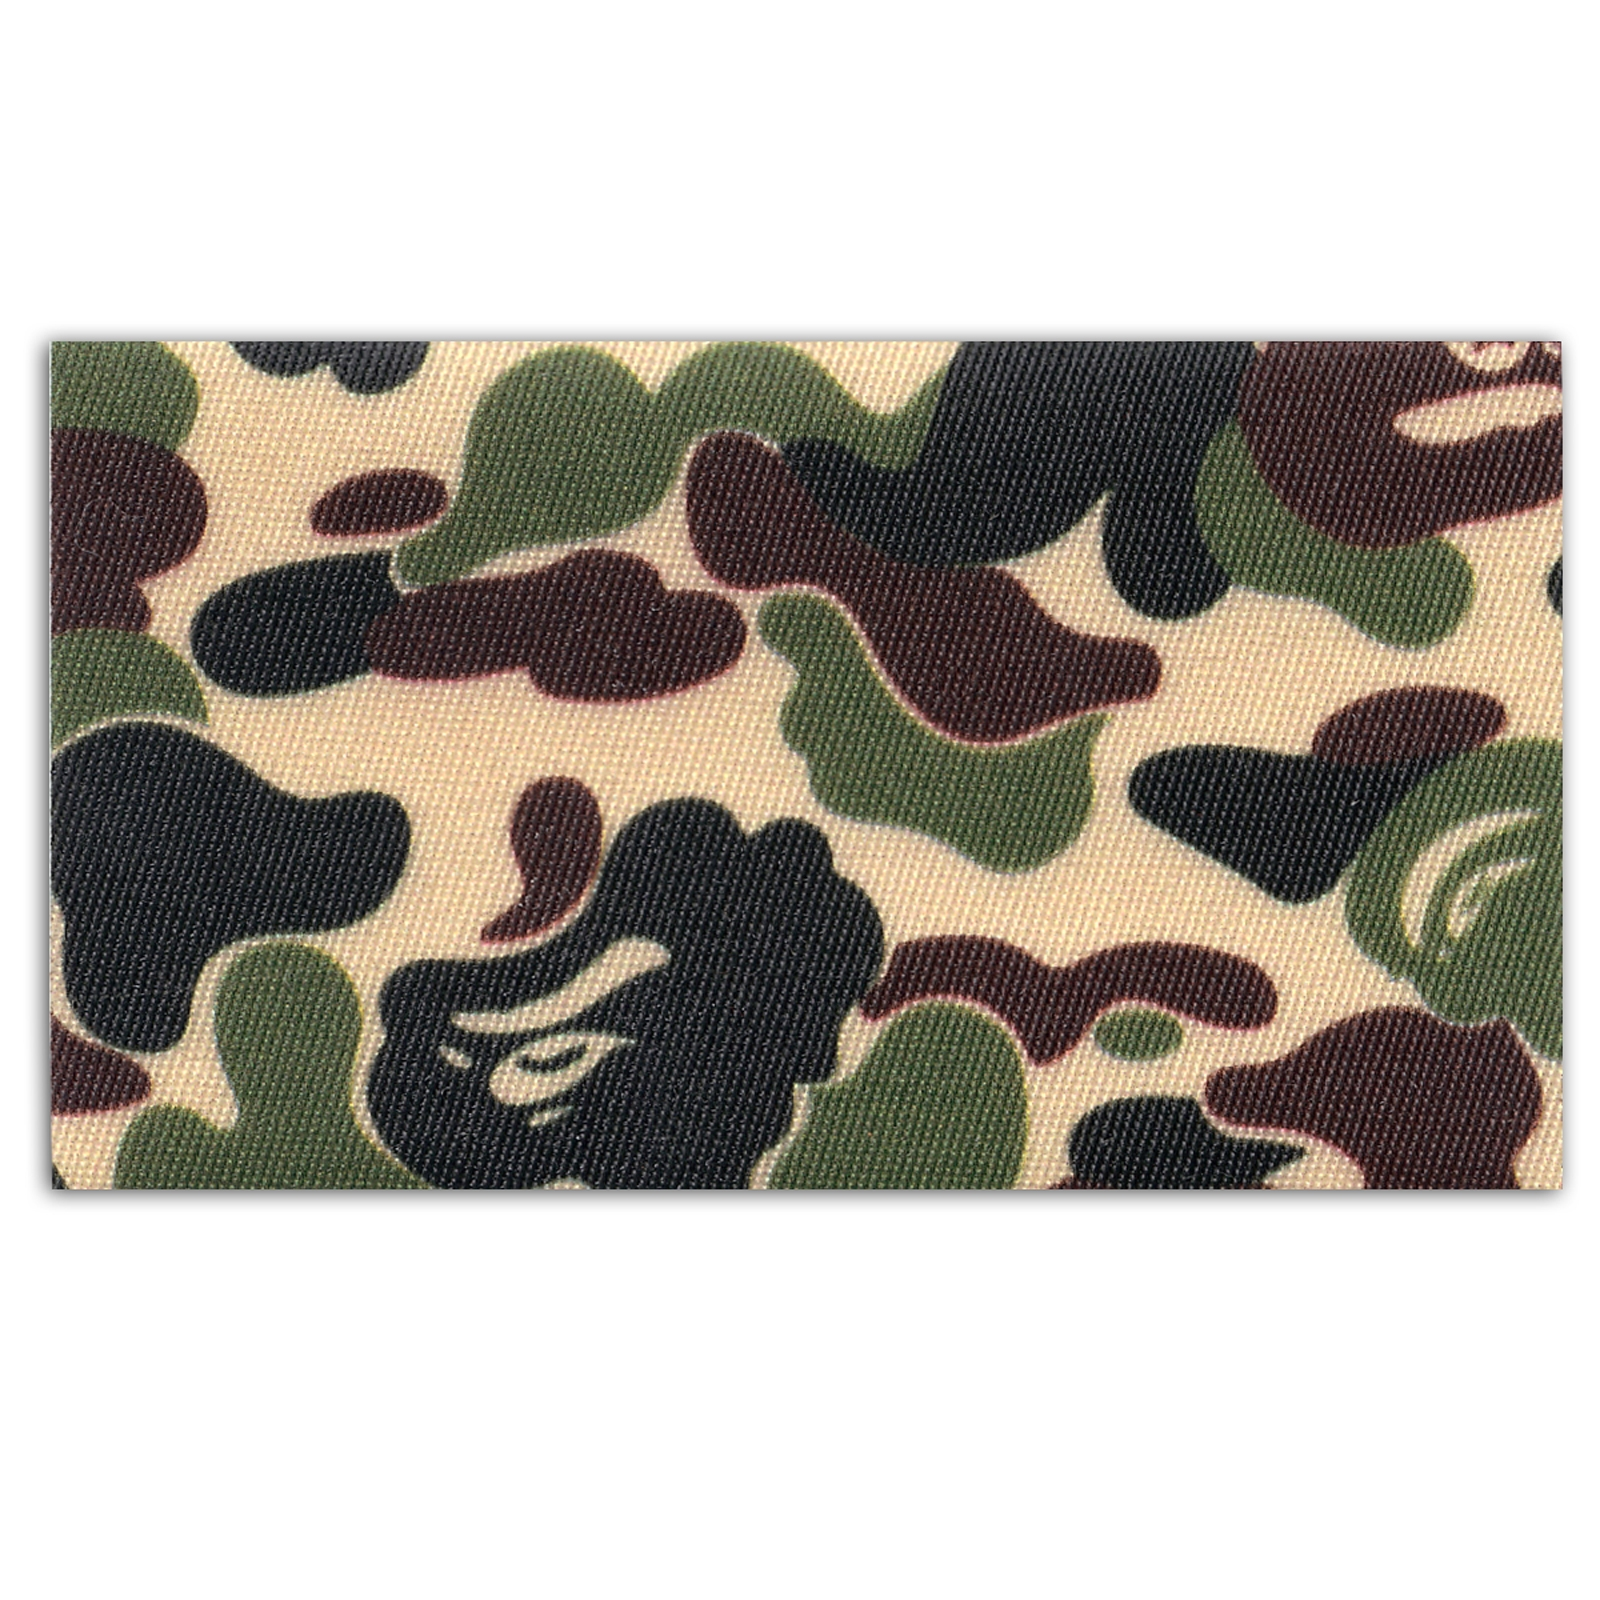 Ape Head Green Camouflage Pattern Box Print Iron On Patch